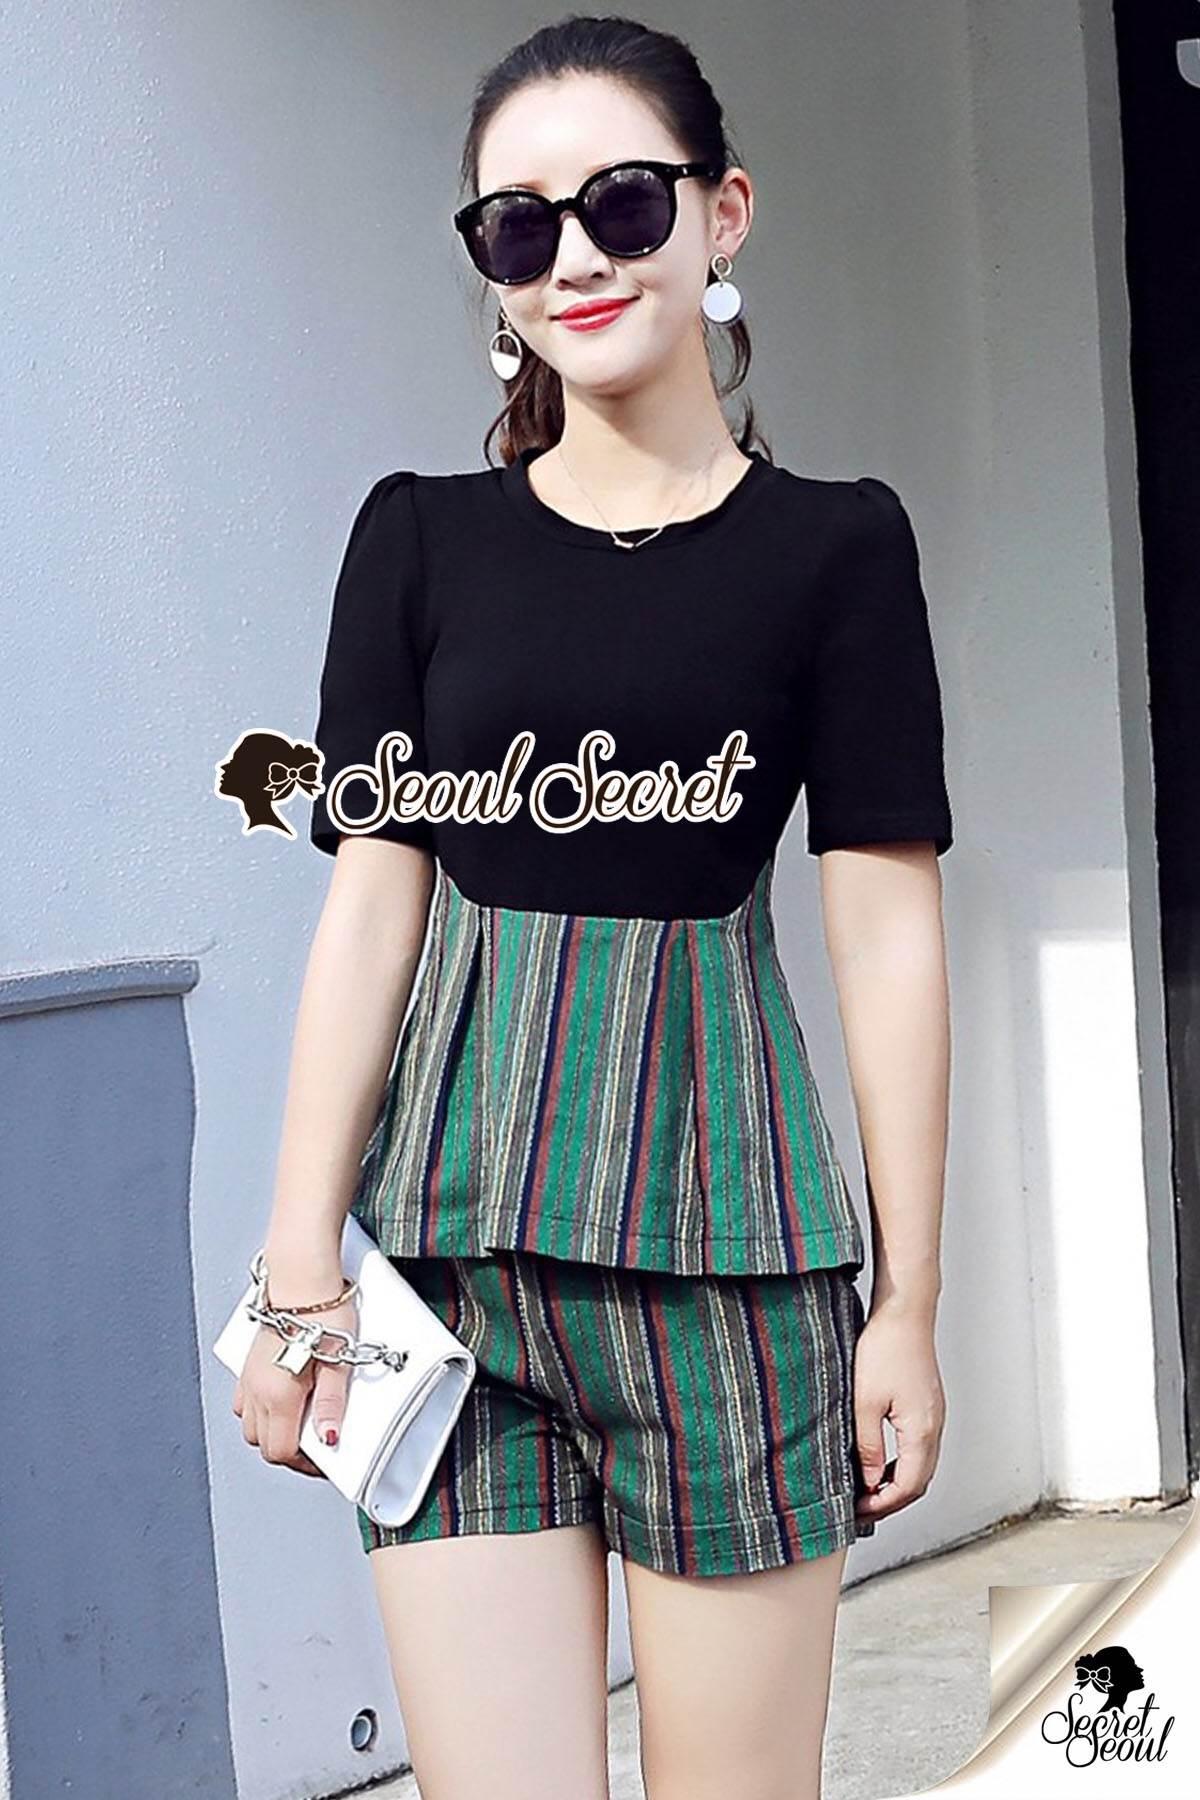 Seoul Secret Say's... Chic Line Swiiffy Pleat Tail Set